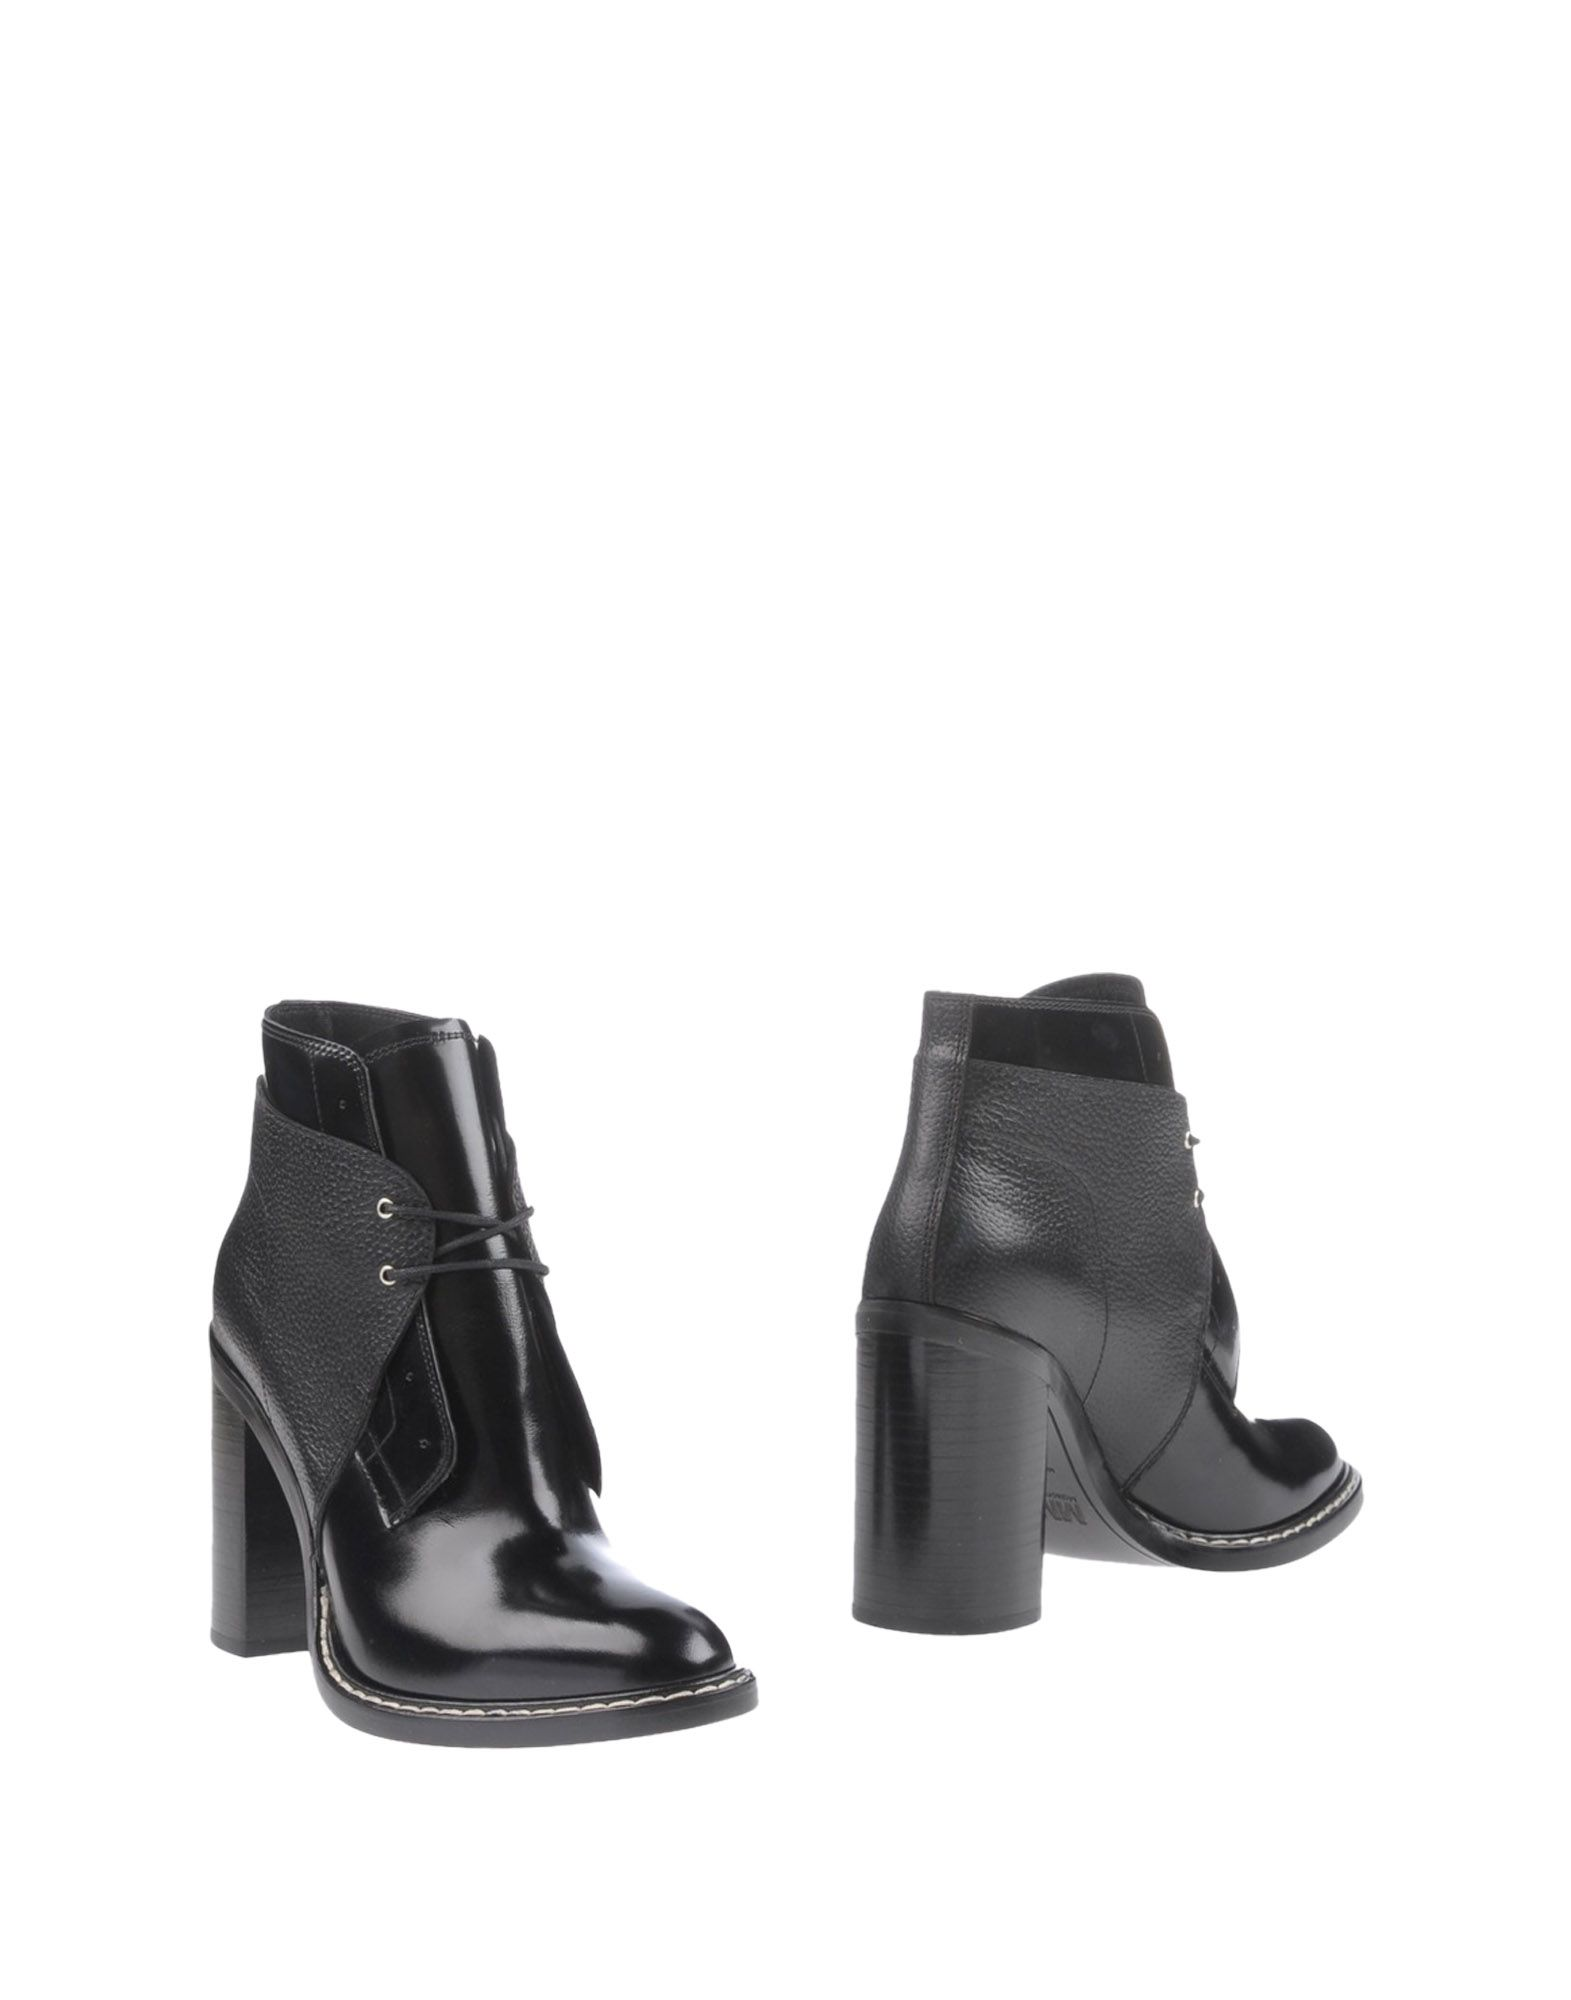 Mm6 Maison Margiela Stiefelette Damen  11213129PS Neue Schuhe